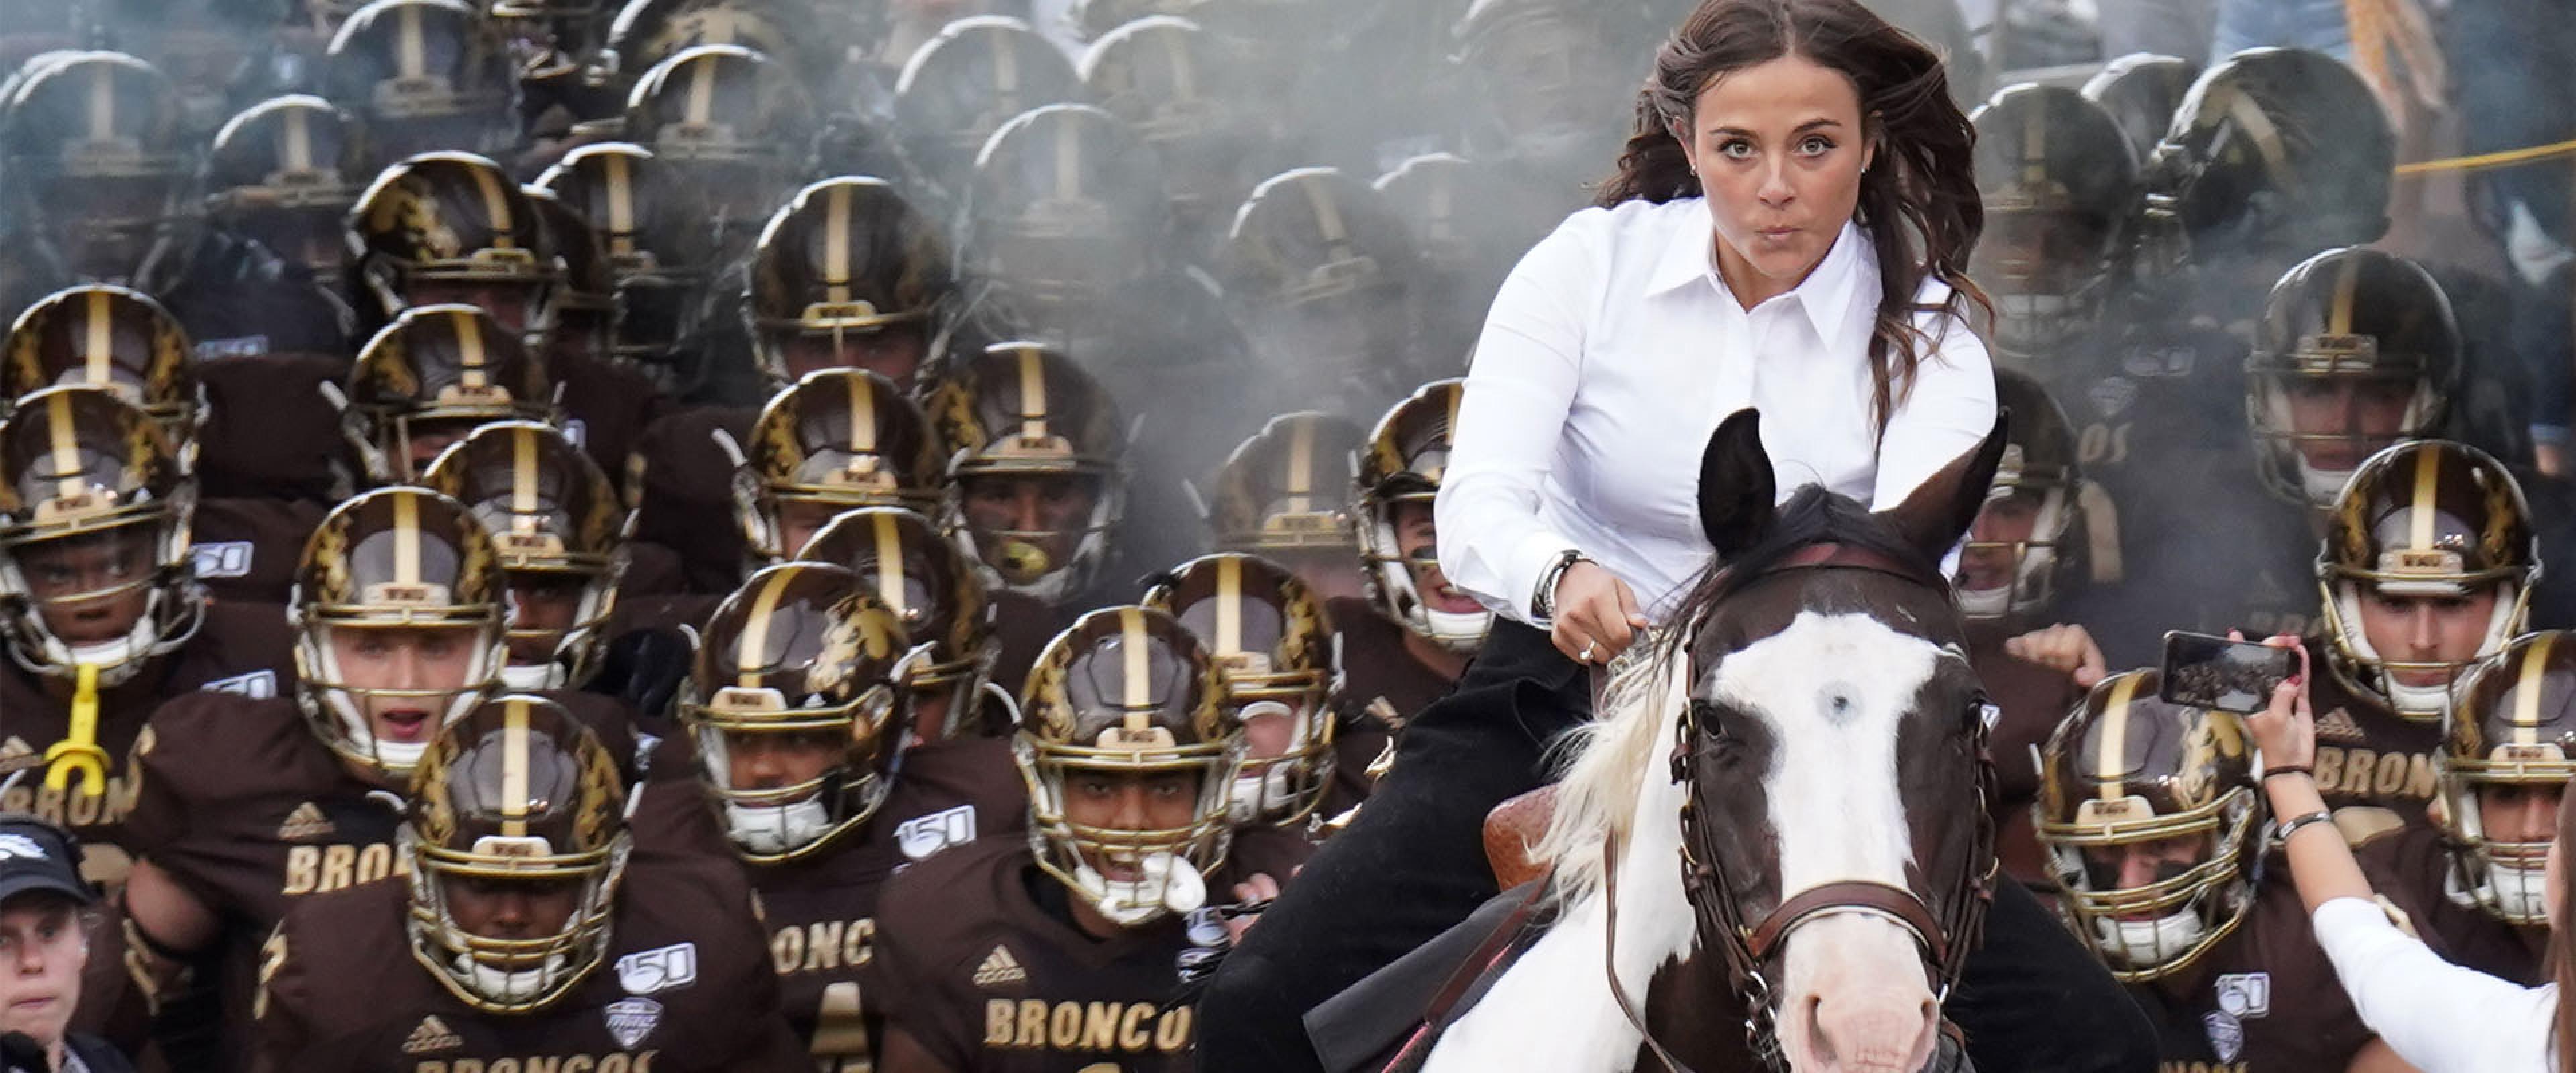 A student on horseback leads the WMU football team onto the field